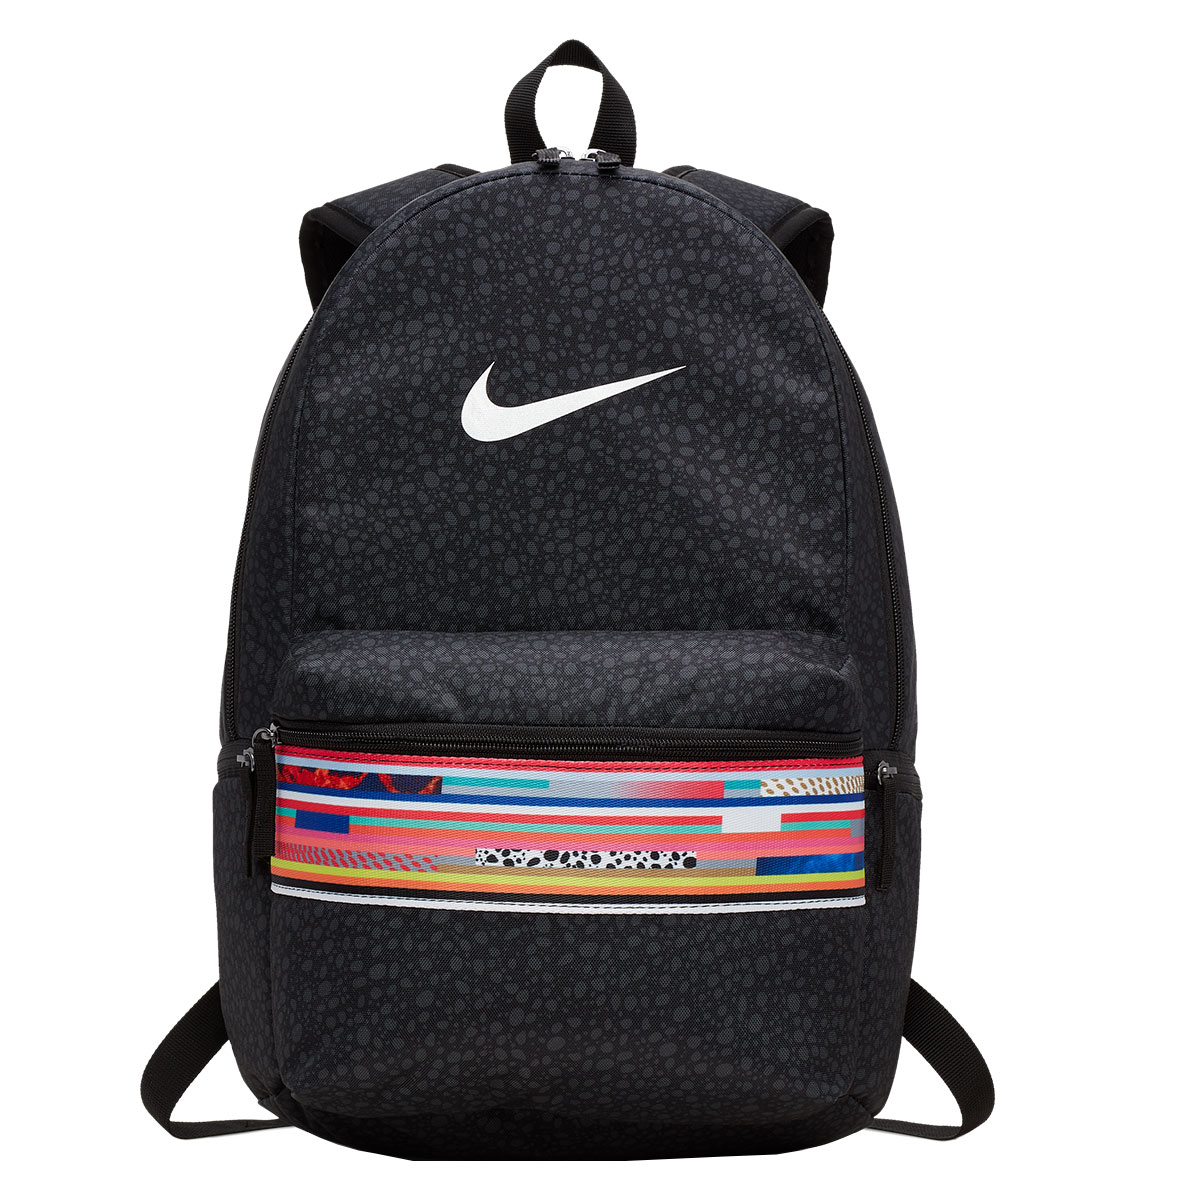 8f49e91c30539 Nike Kinder Rucksack Mercurial Backpack schwarz weiß - Fussball Shop